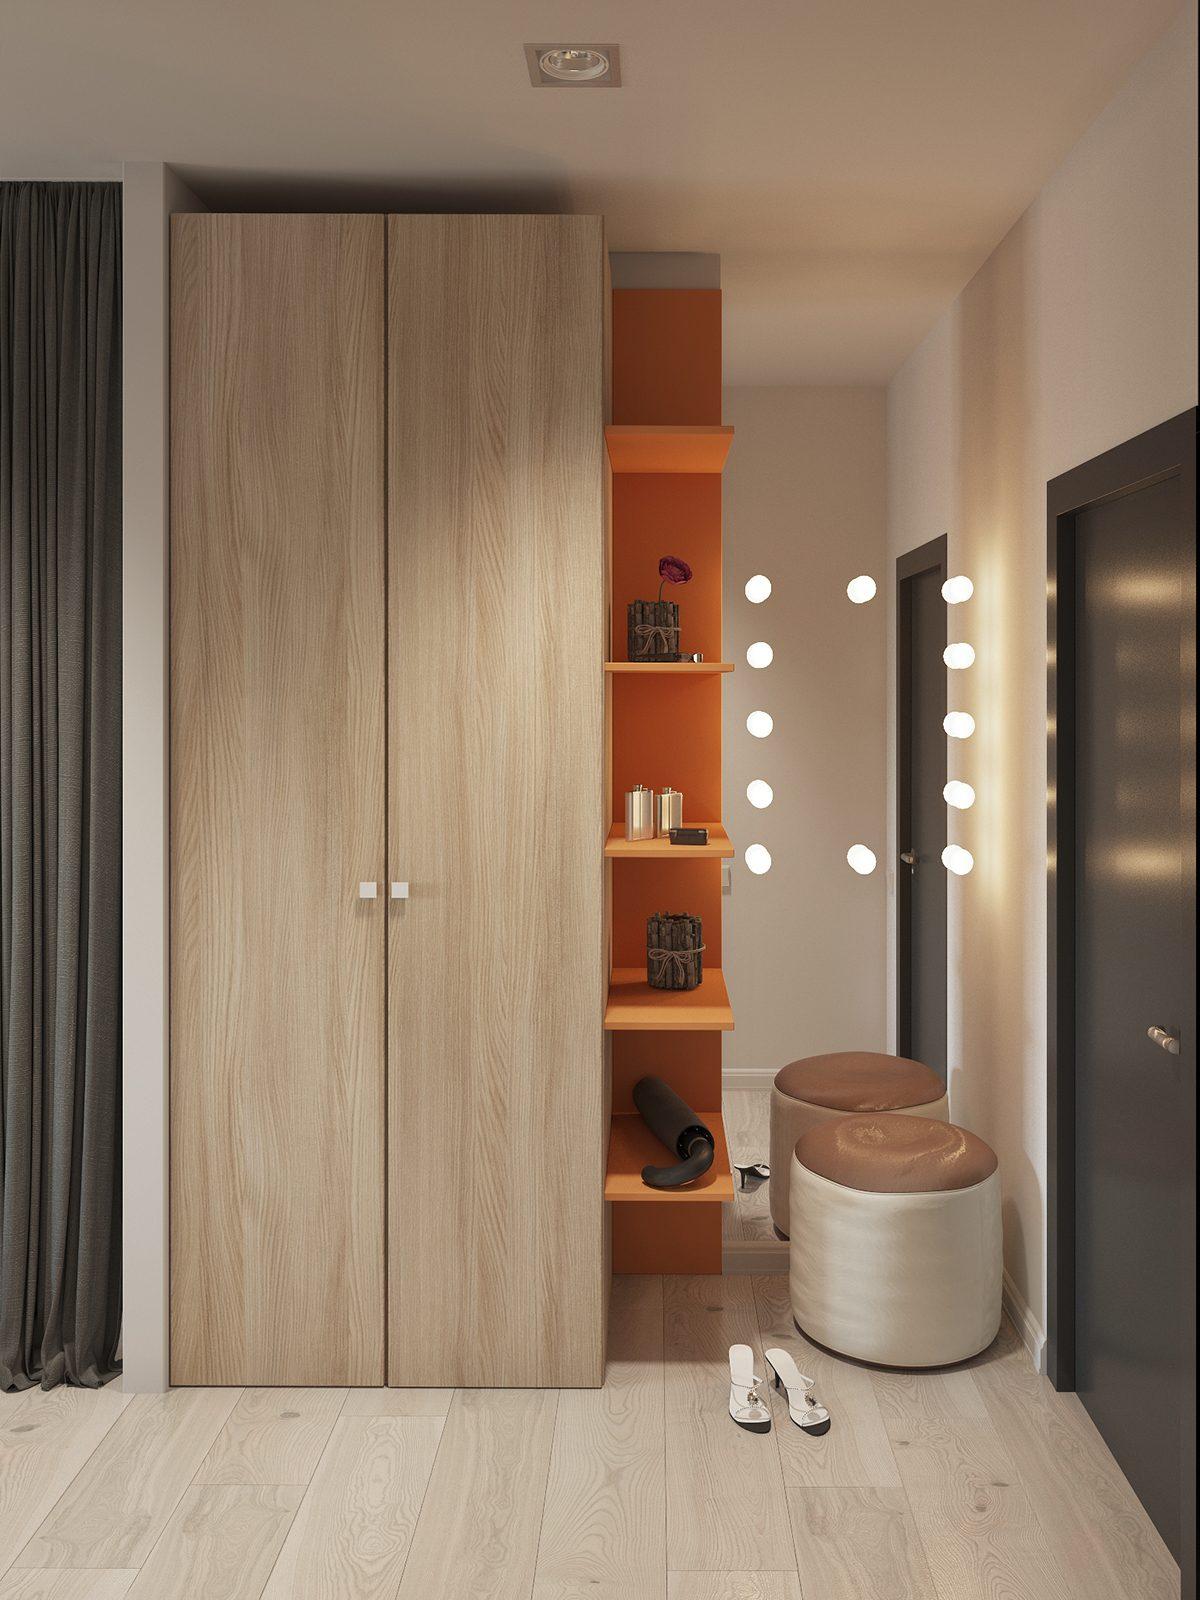 Stylish apartment design ideas